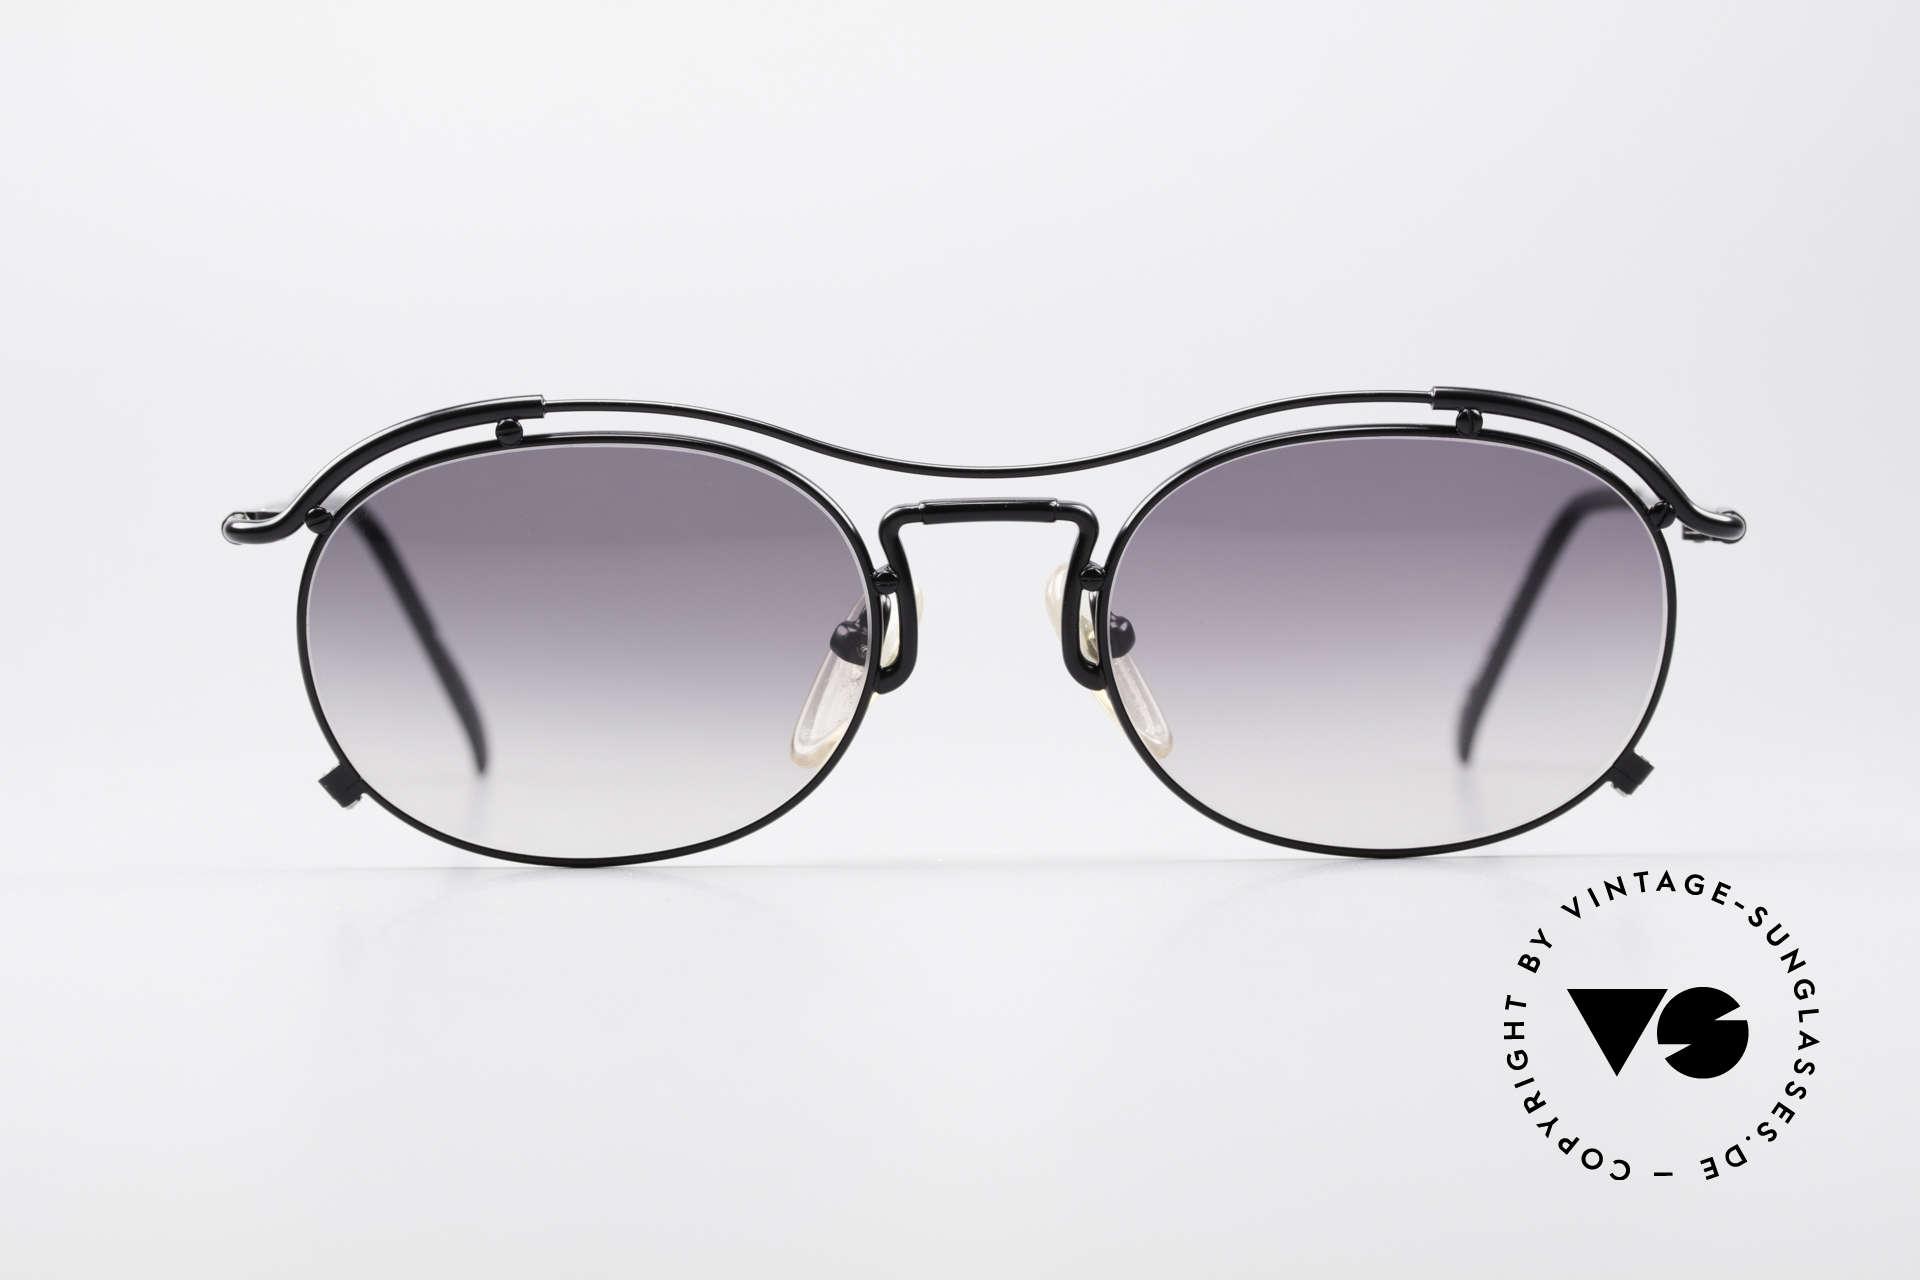 Jean Paul Gaultier 55-2170 Vintage JPG Sunglasses, peppy frame construction; full of verve, RARITY!, Made for Men and Women